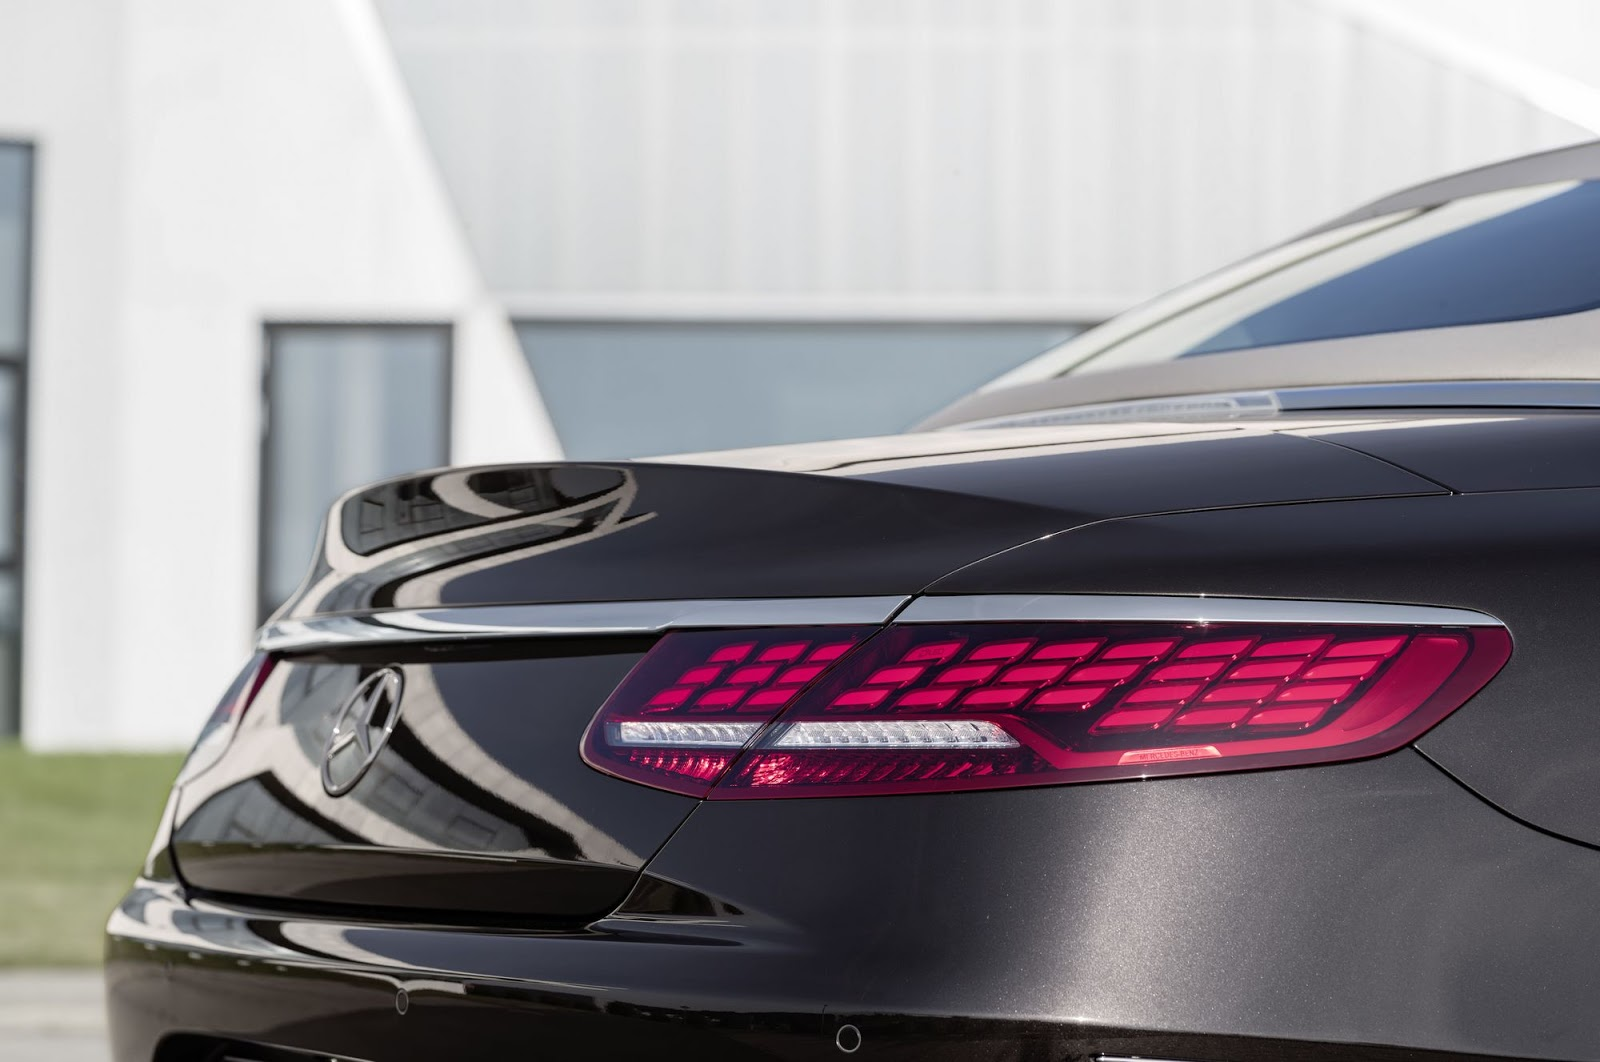 Mercedes-Benz S-Klasse Cabriolet; A 217; Exterieur: designo mokkaschwarz;  OLED-Rückleuchte Mercedes-Benz S-Class Cabriolet; A 217; Exterior: designo mocha black; OLED rear light